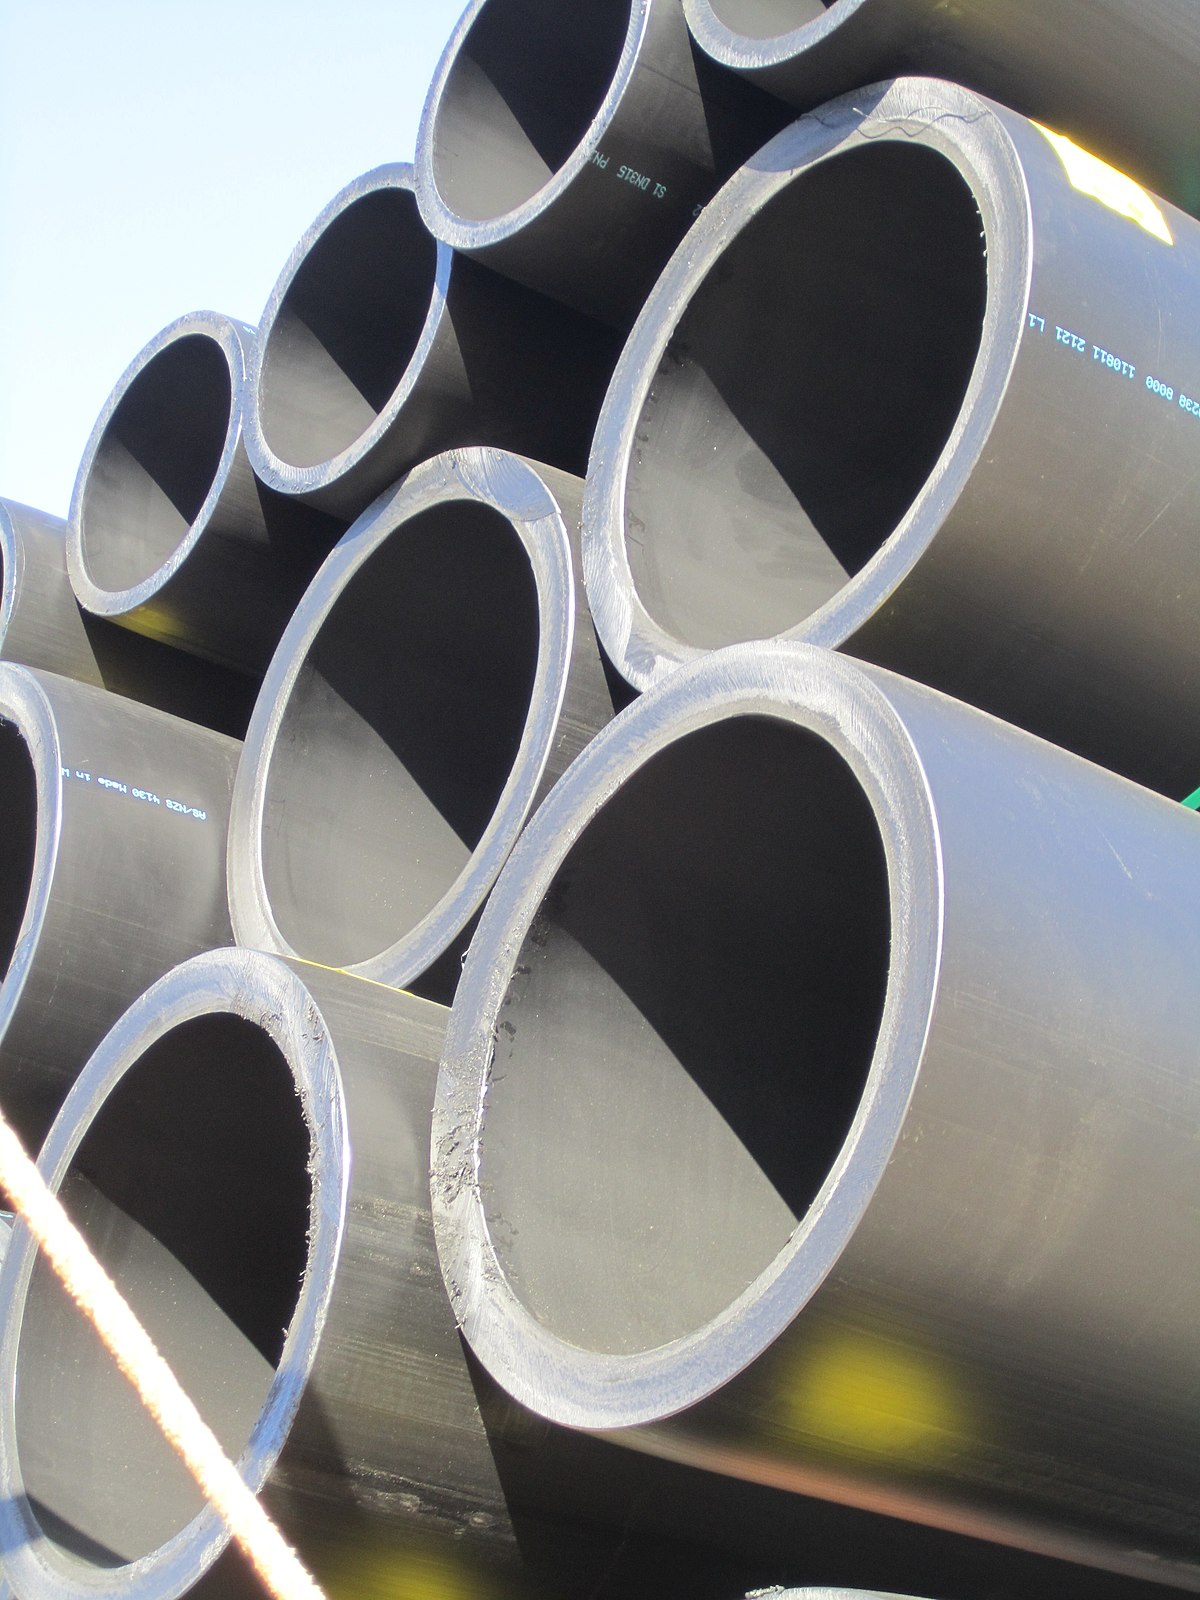 Slurry pipeline - Wikipedia